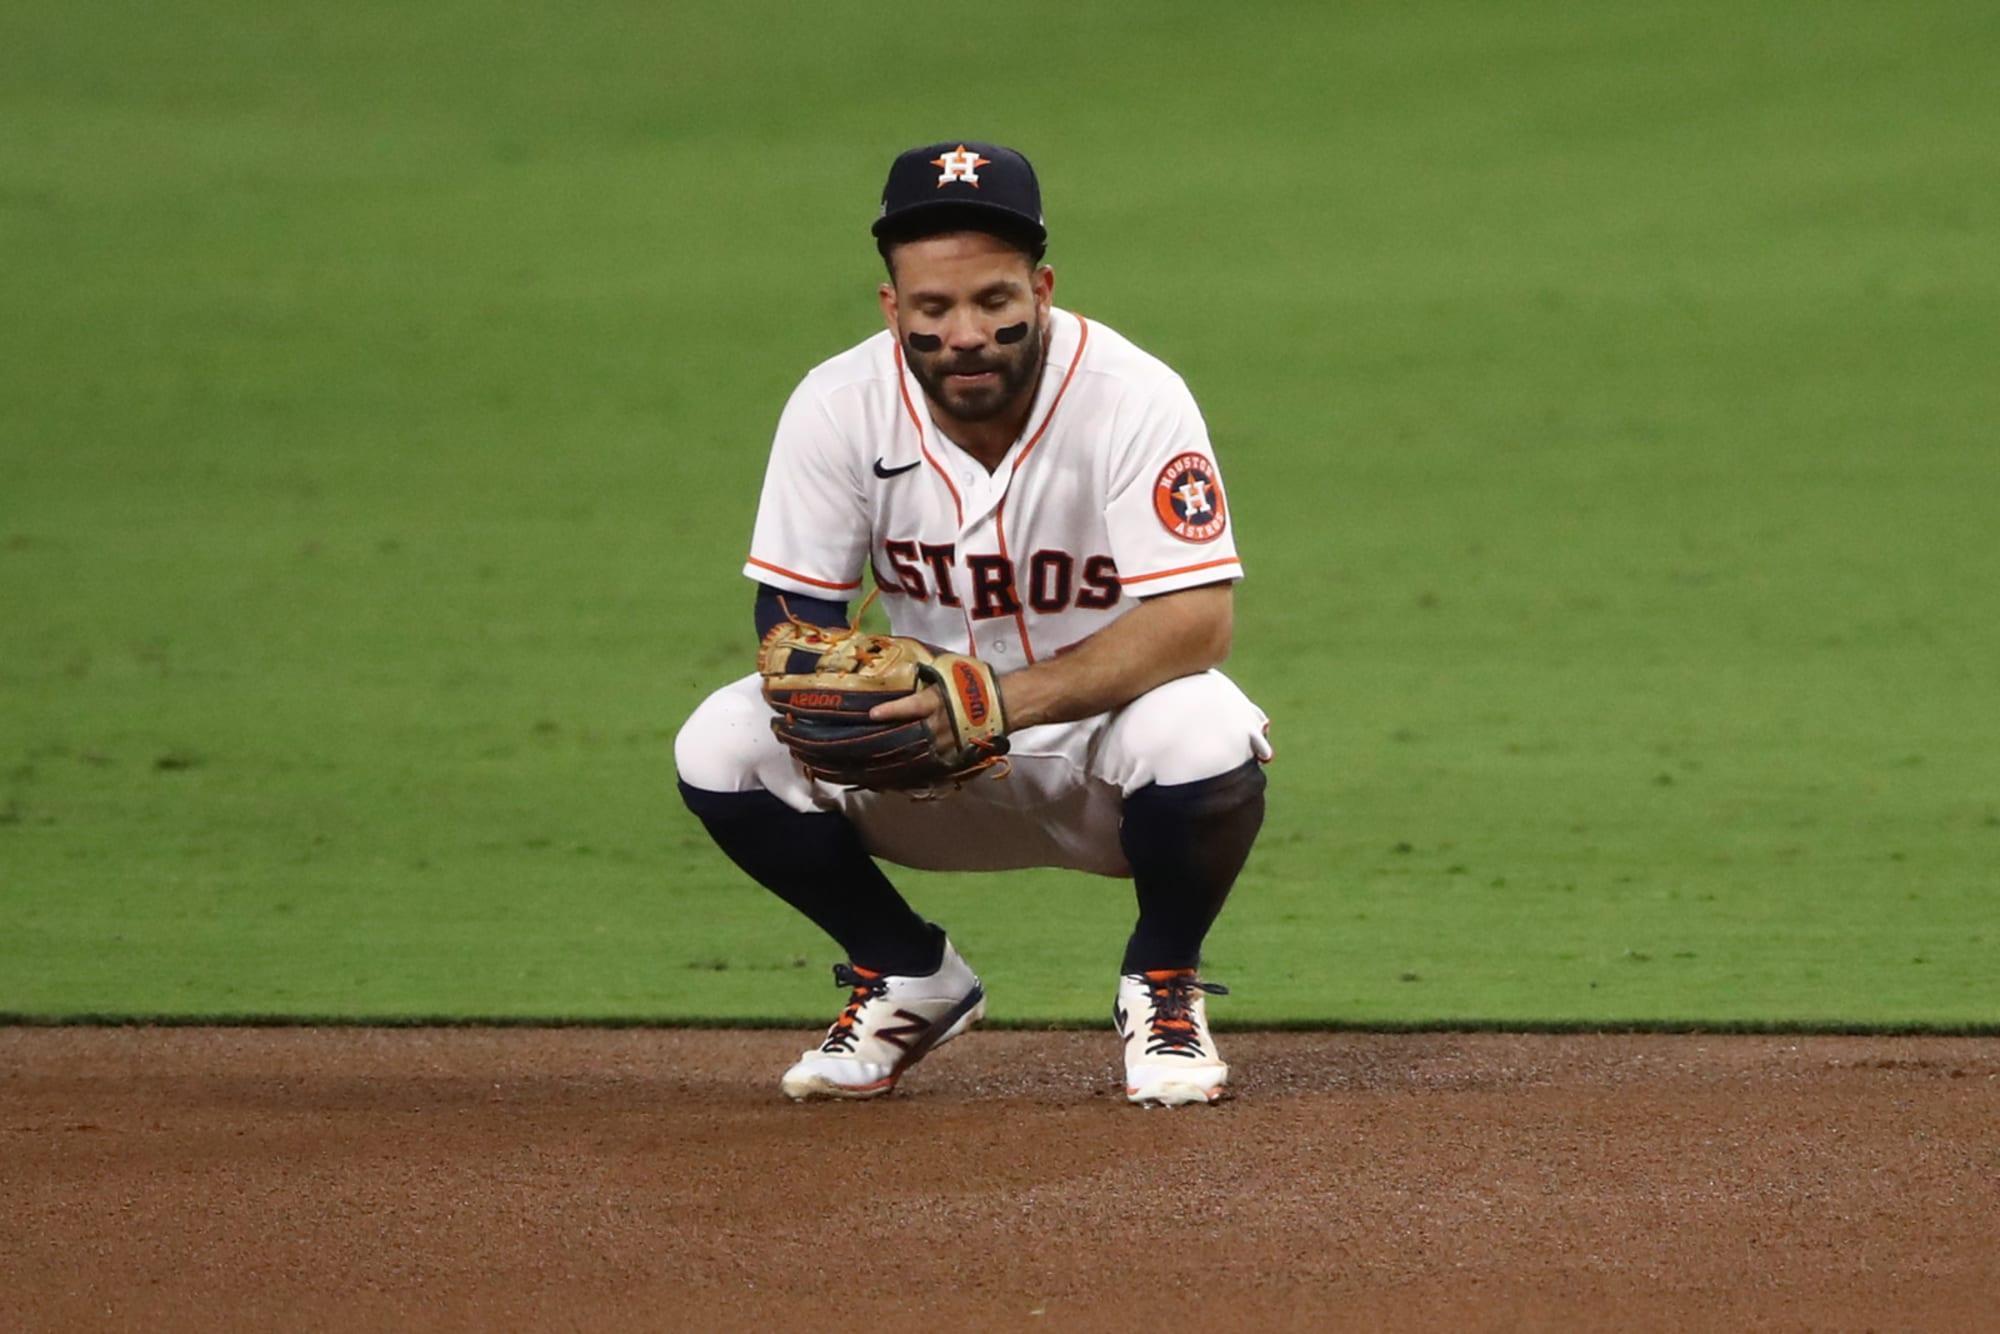 Houston Astros 2020 Year in Review: Jose Altuve slumps